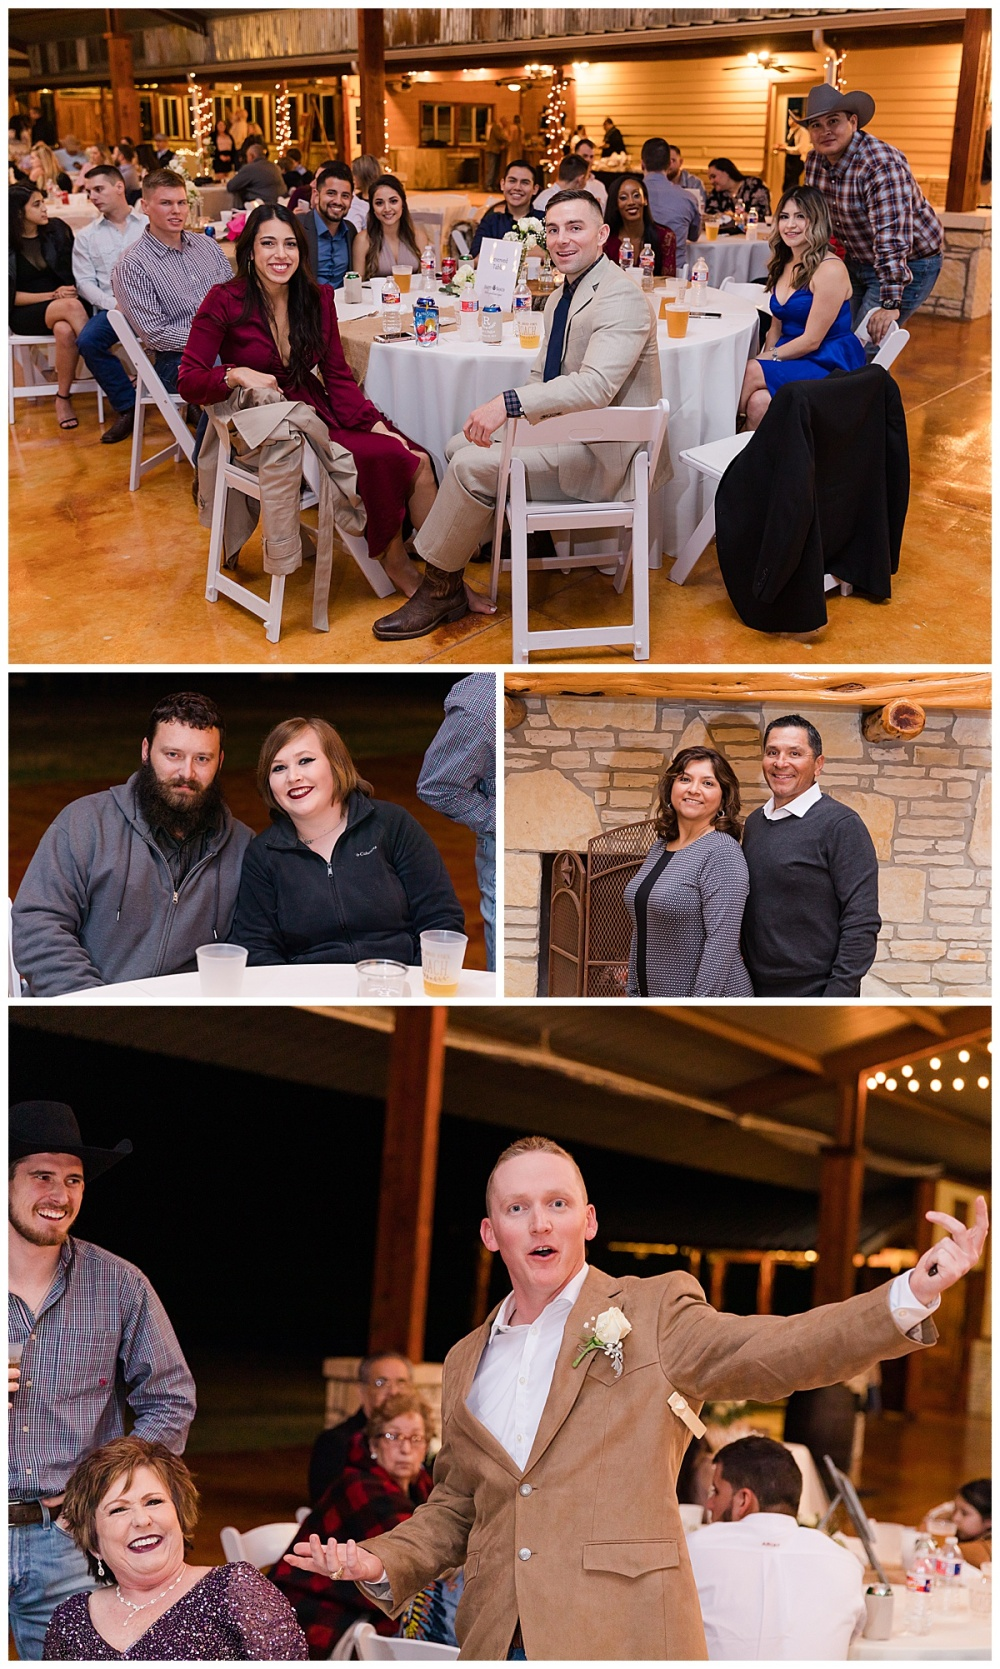 Wedding-Photographer-Texas-Hill-Country-Happy-H-Ranch-Comfor-Texas-Carly-Barton-Photography_0076.jpg